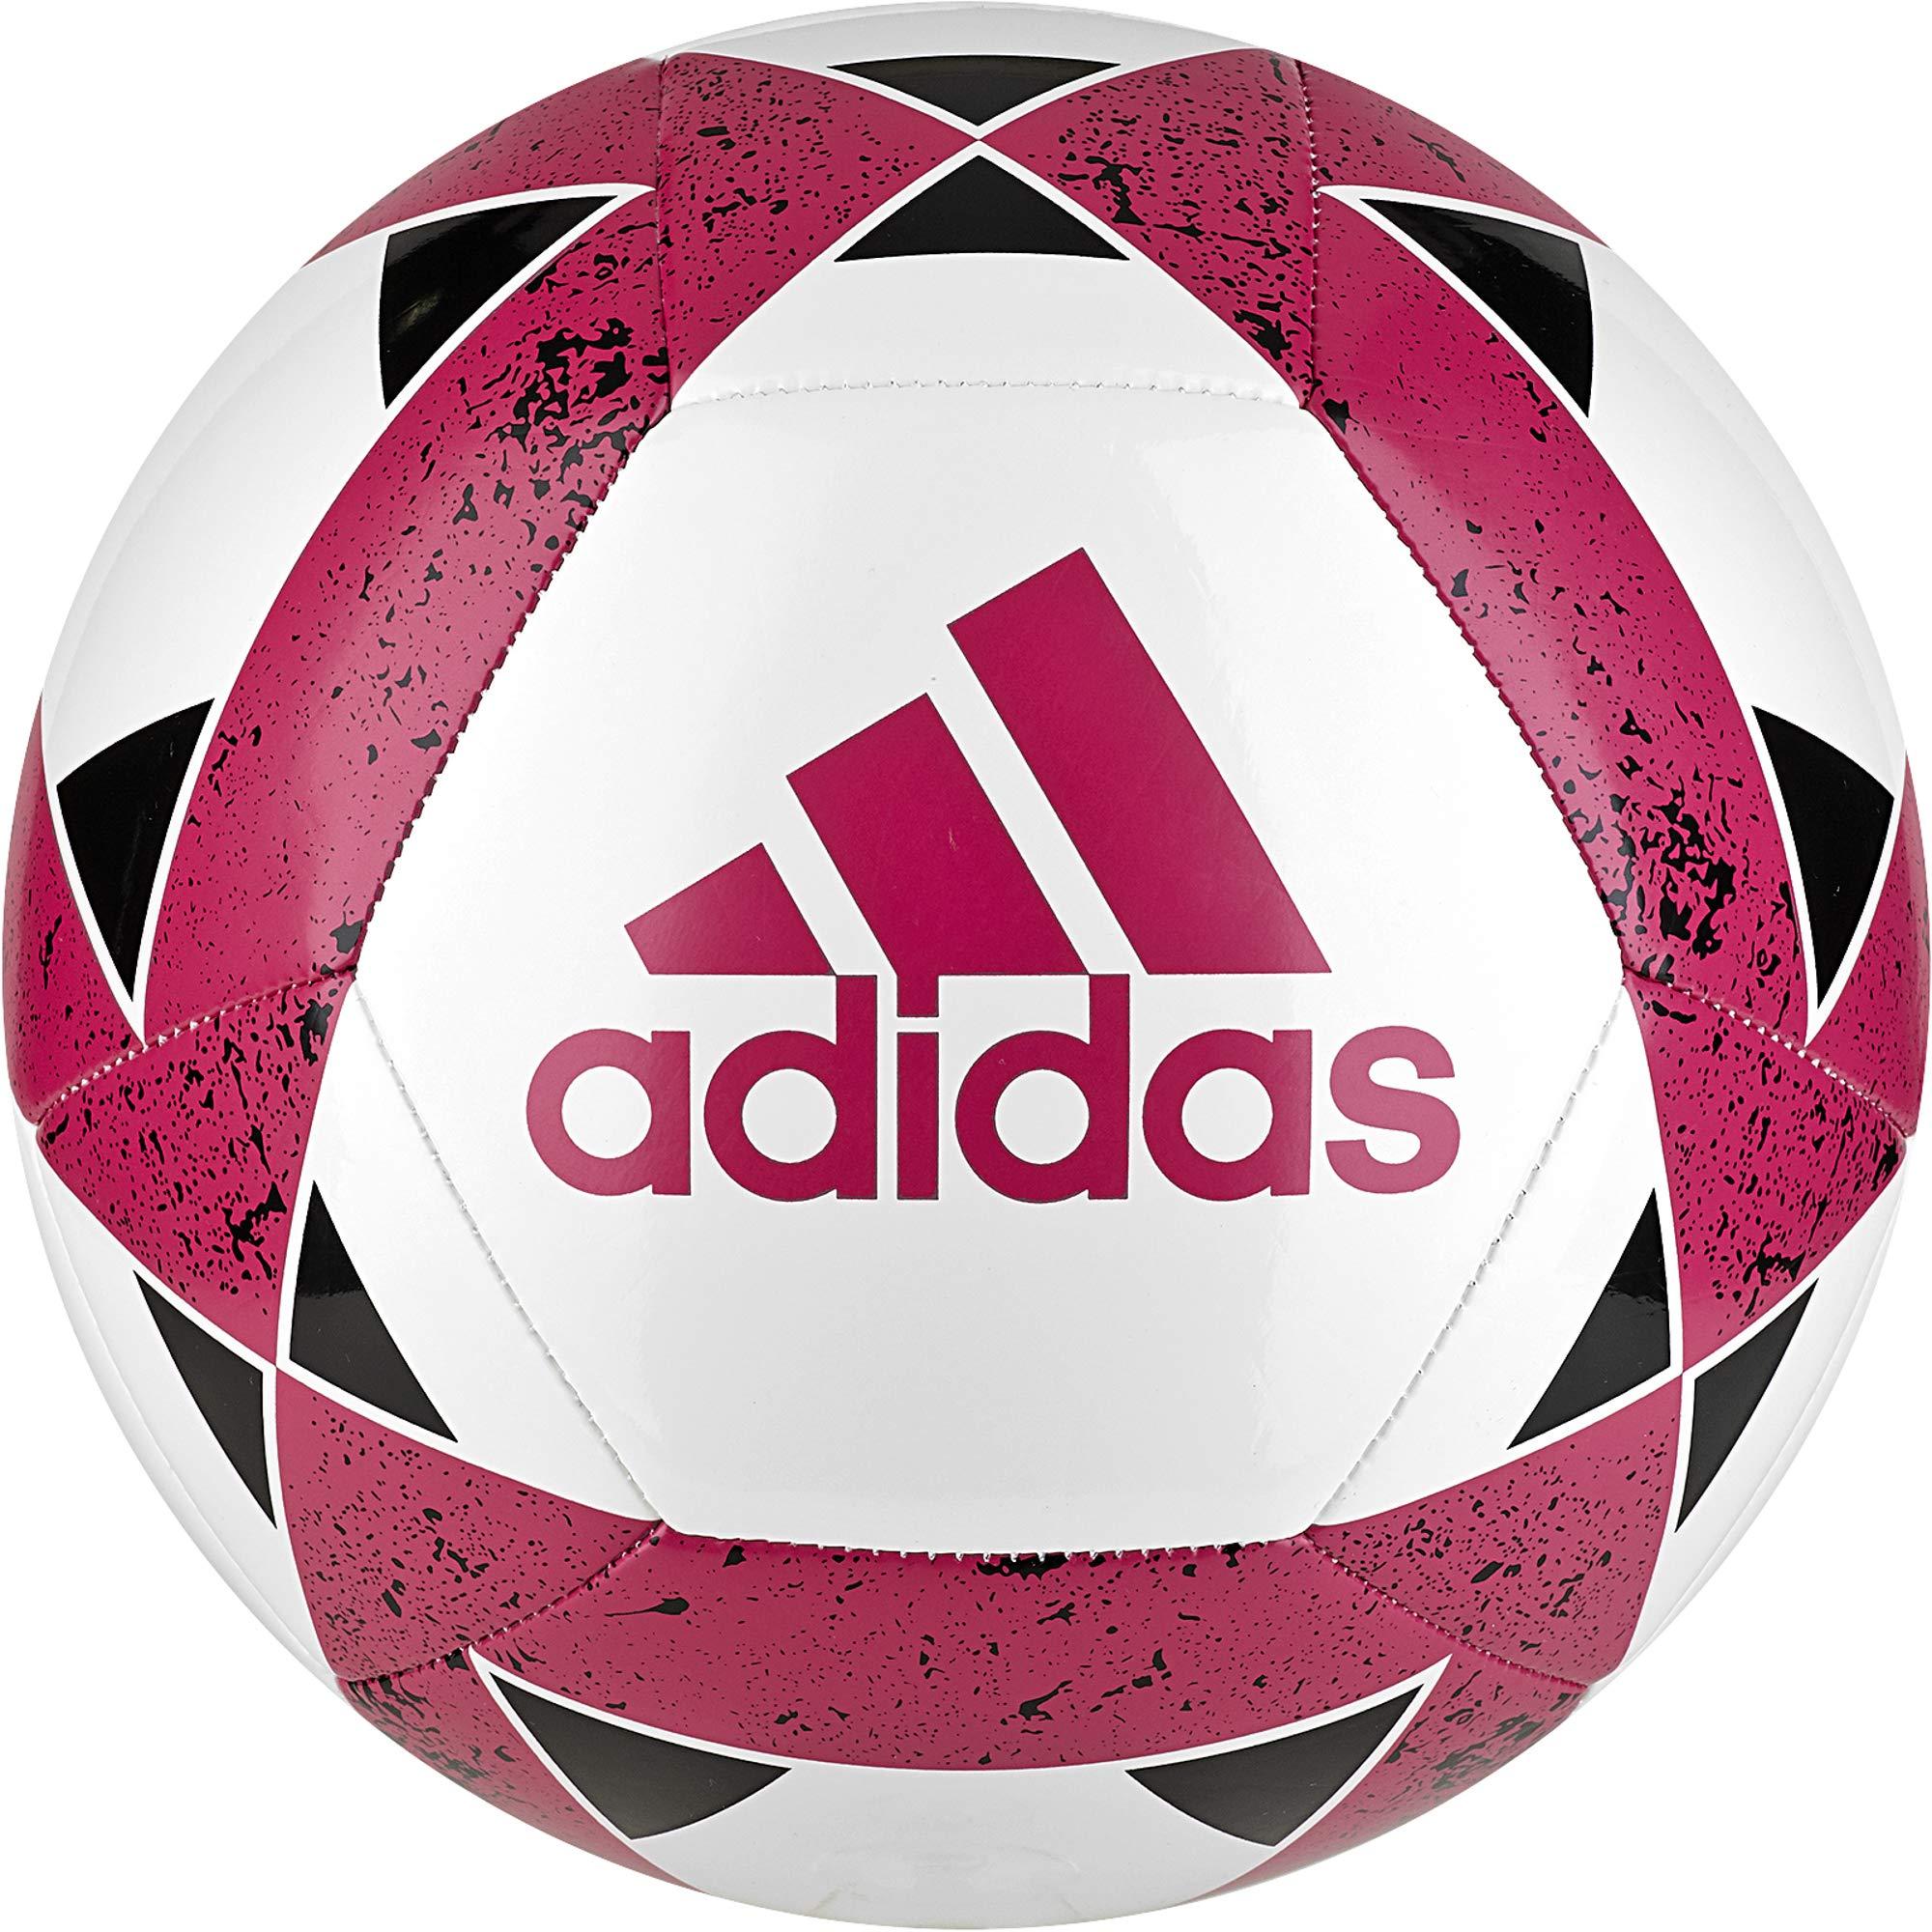 Adidas Starlancer V Football Size 5 (B07F7PNT7N) Amazon Price History, Amazon Price Tracker